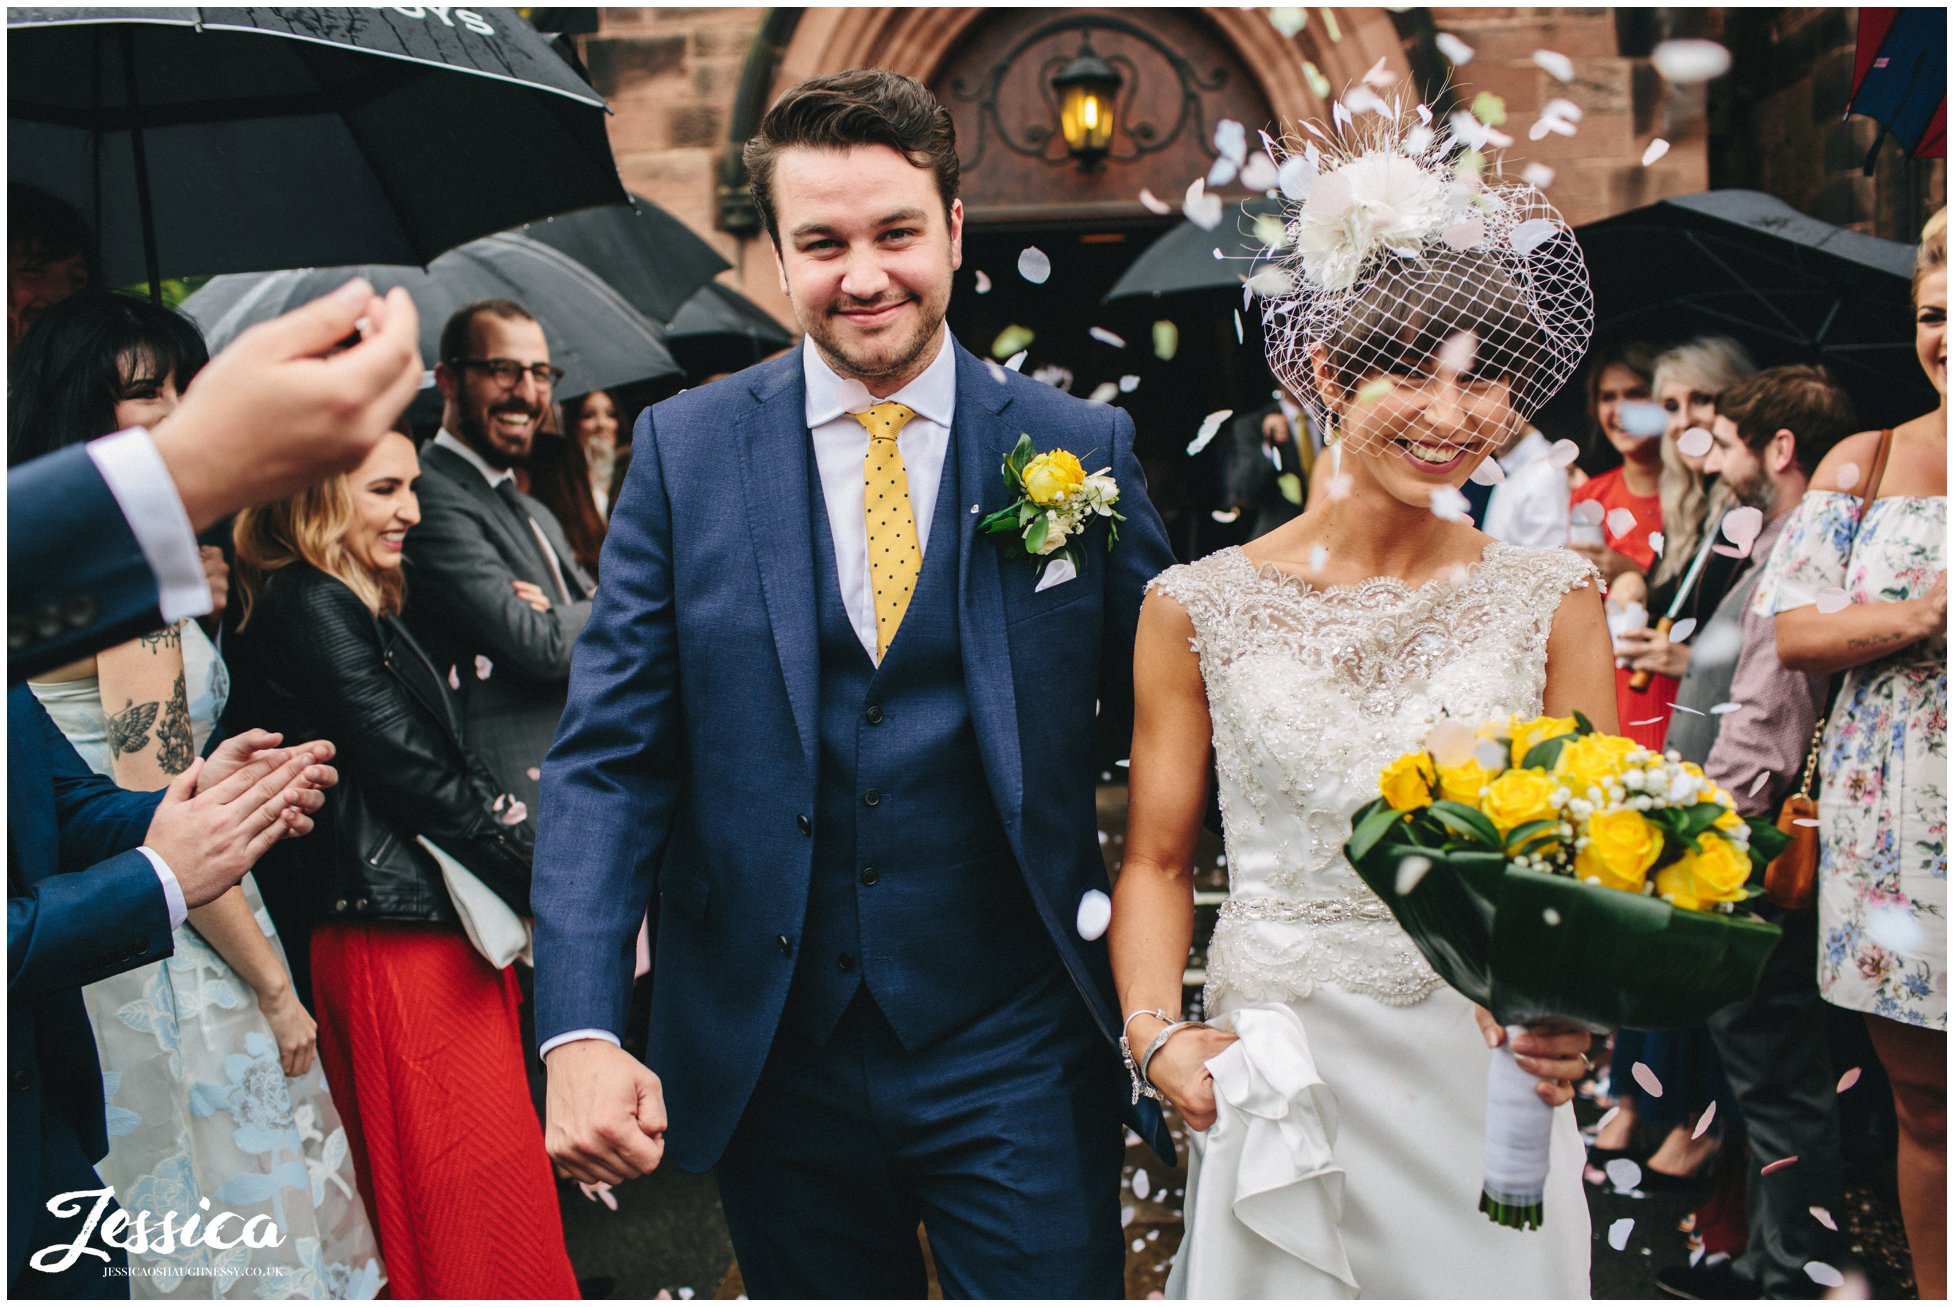 bride & groom walking through confetti line at Chester Church after their wedding